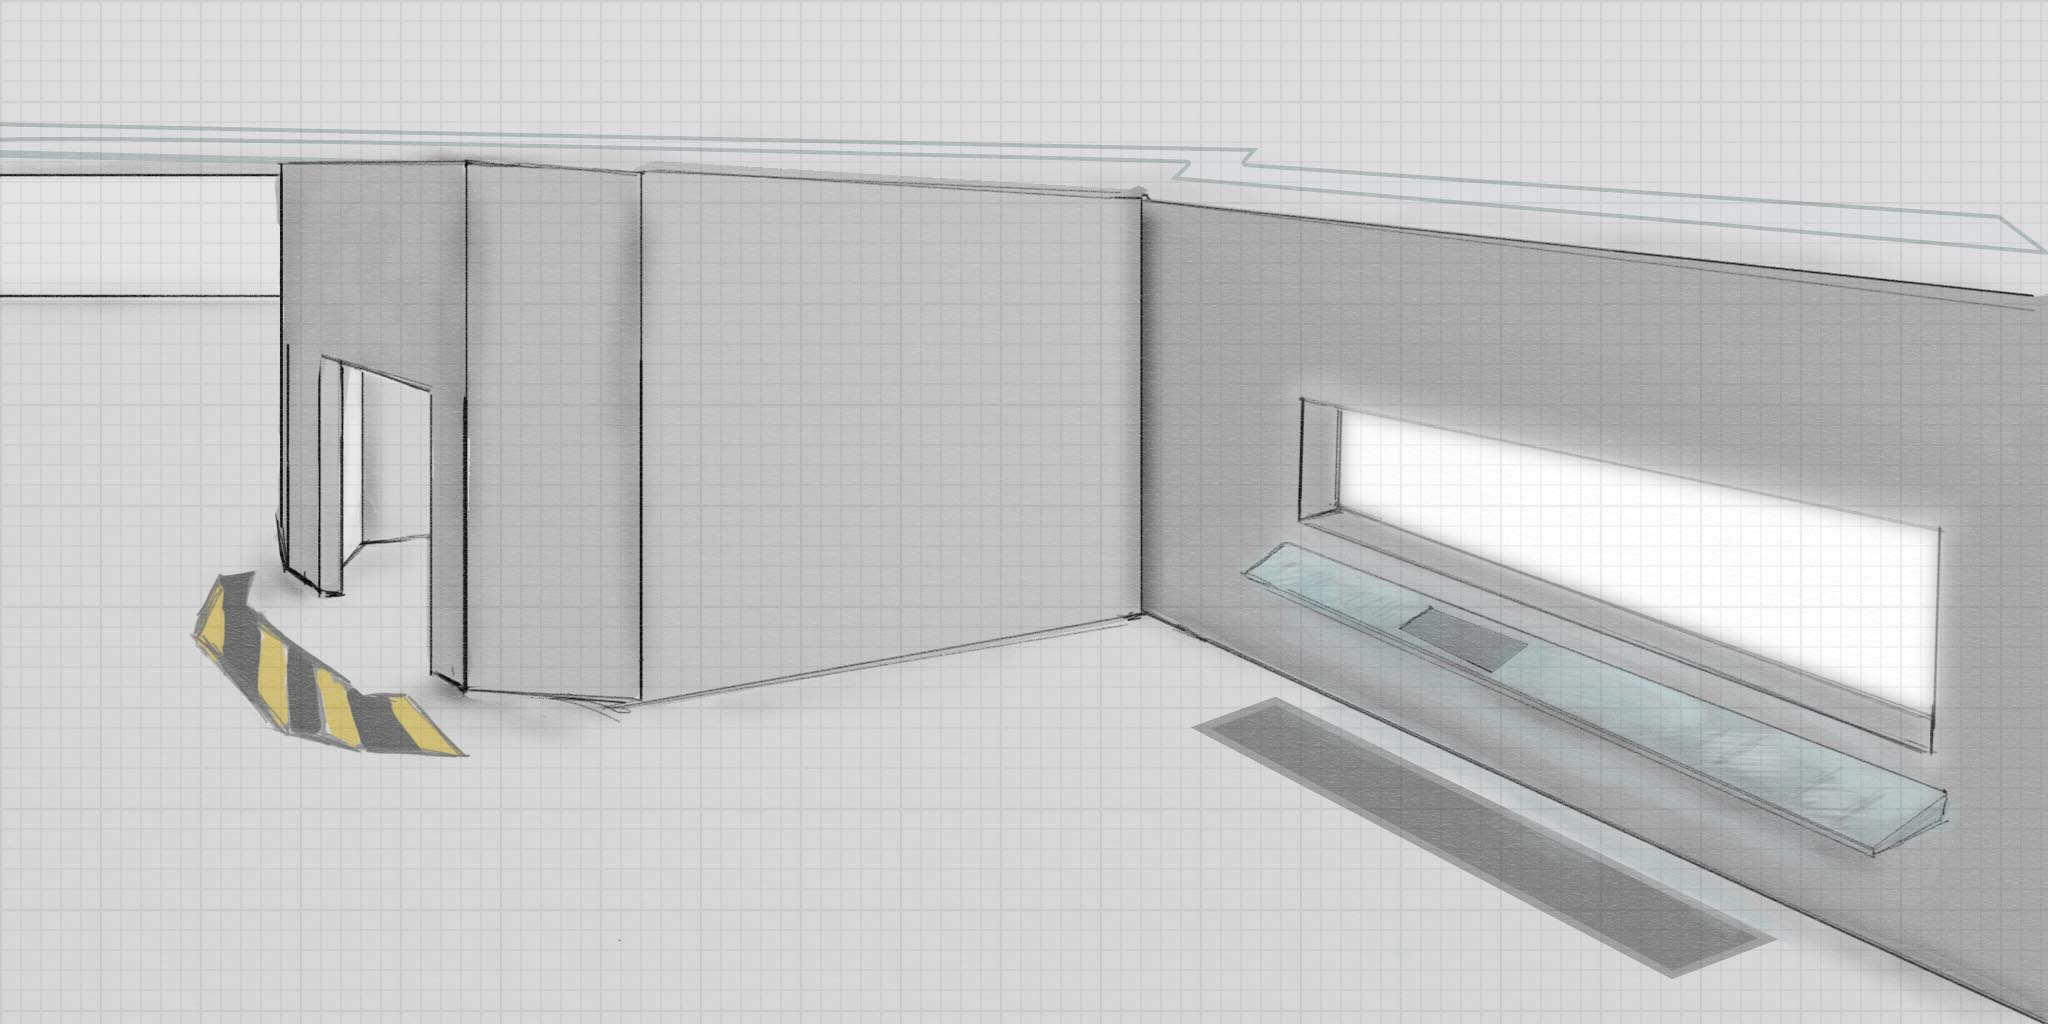 Reactor Control Room Concept